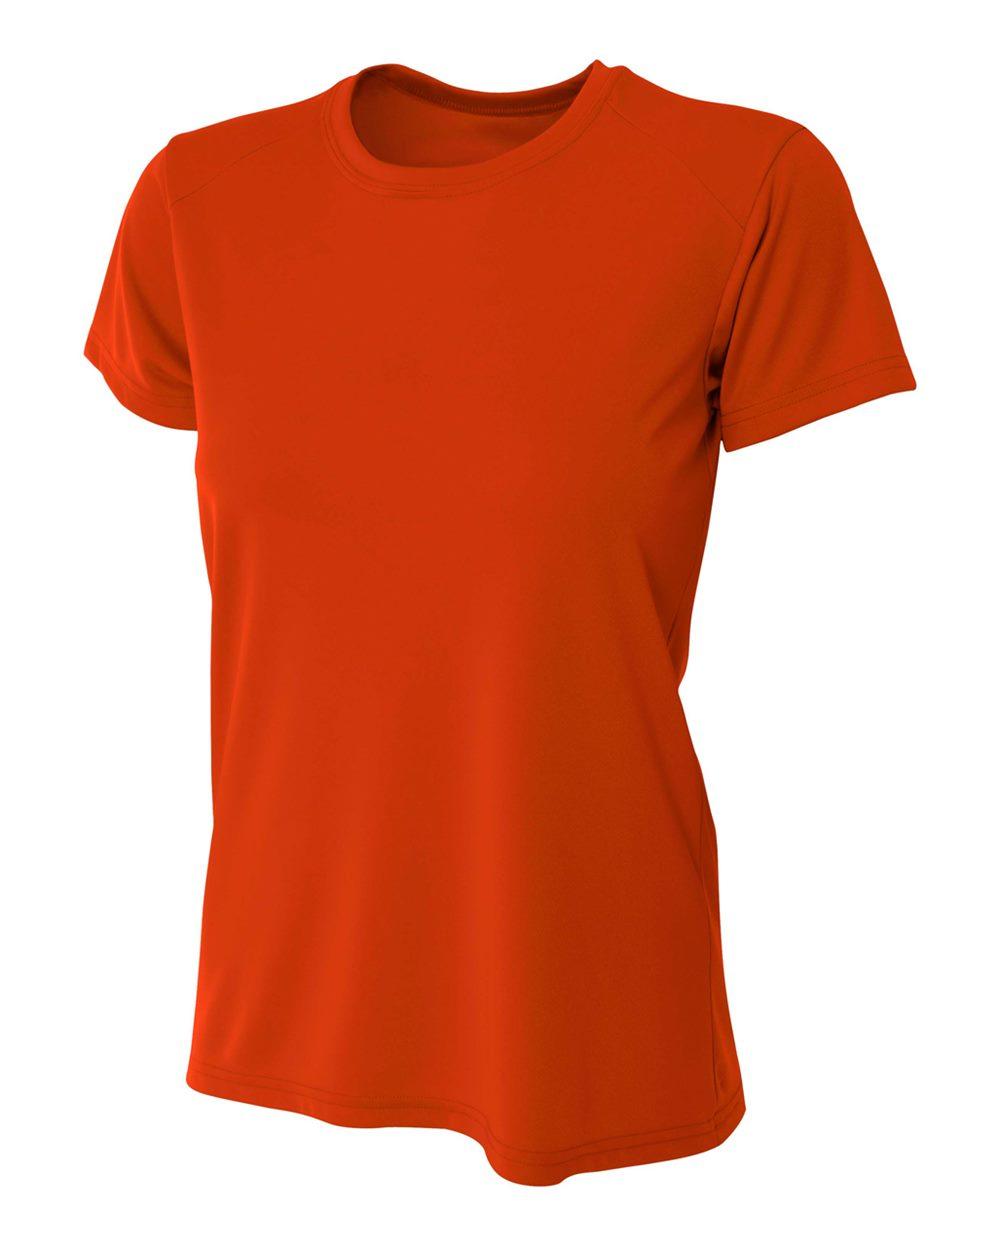 womens-polo-mwicking-orange.jpg